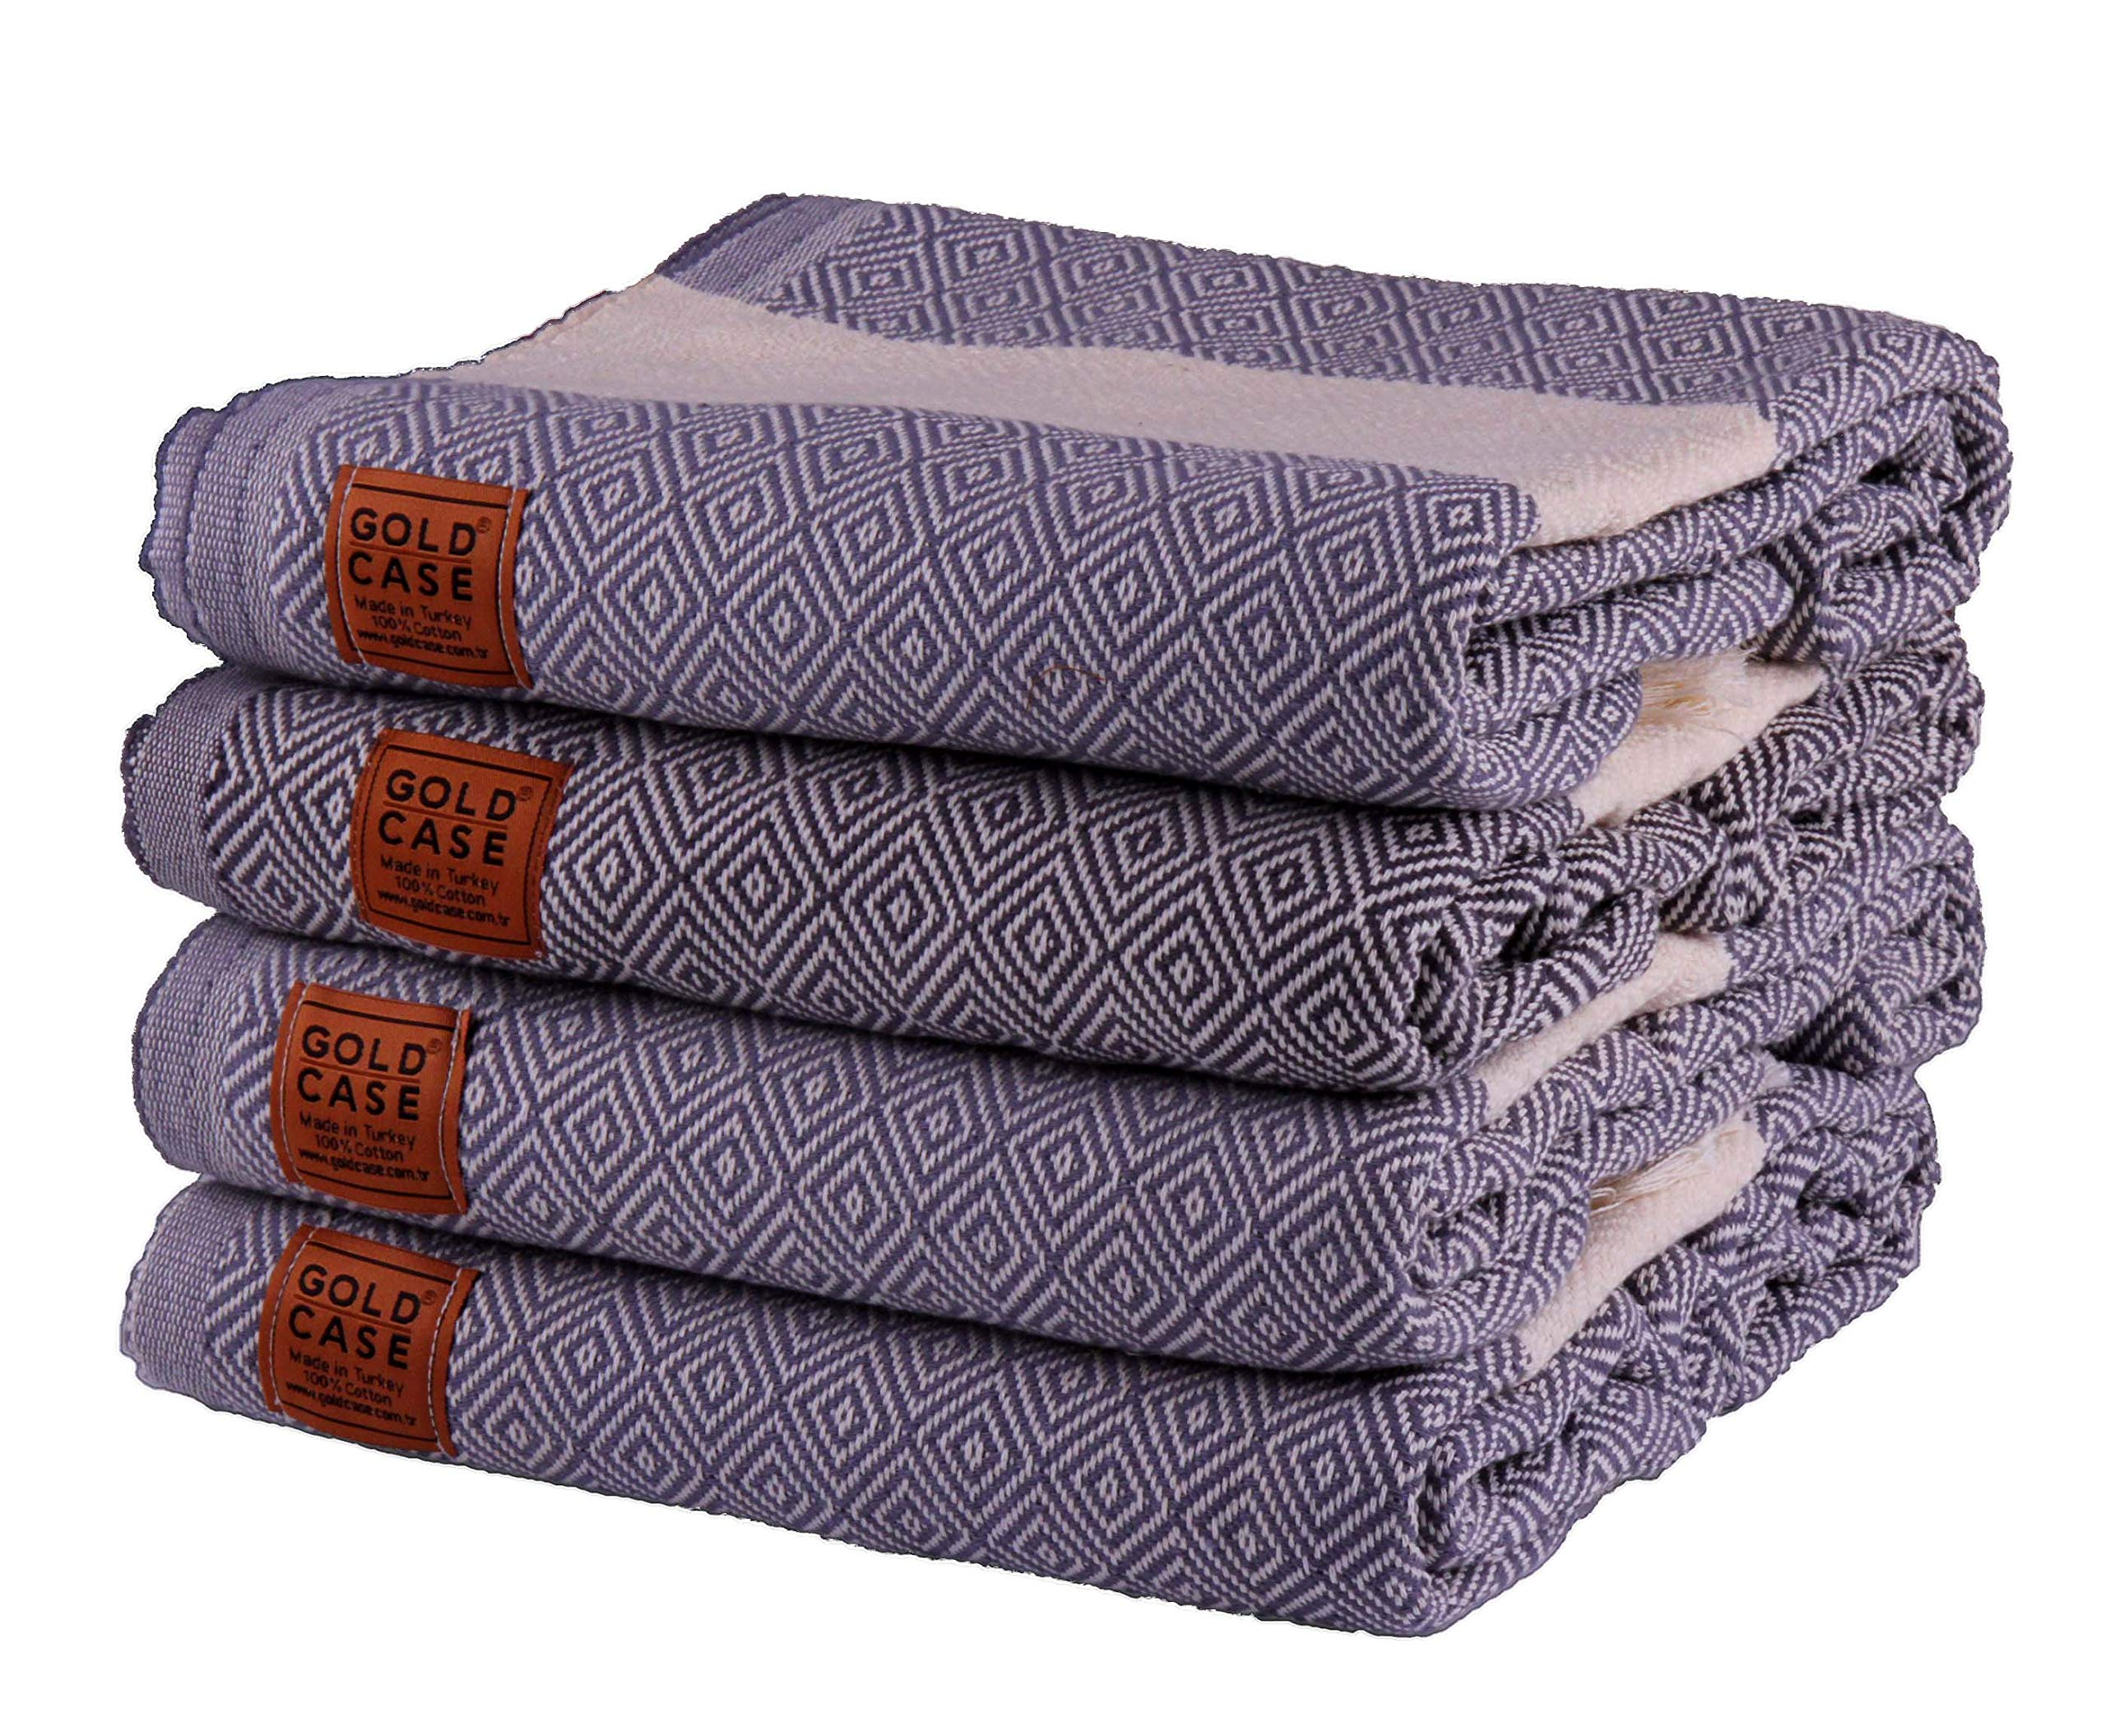 Gold Case Set of 4 XXL and Thick Hermes Turkish Cotton Bath Beach Hammam Towels Peshtemal Towel Throw Blanket (Smoke)